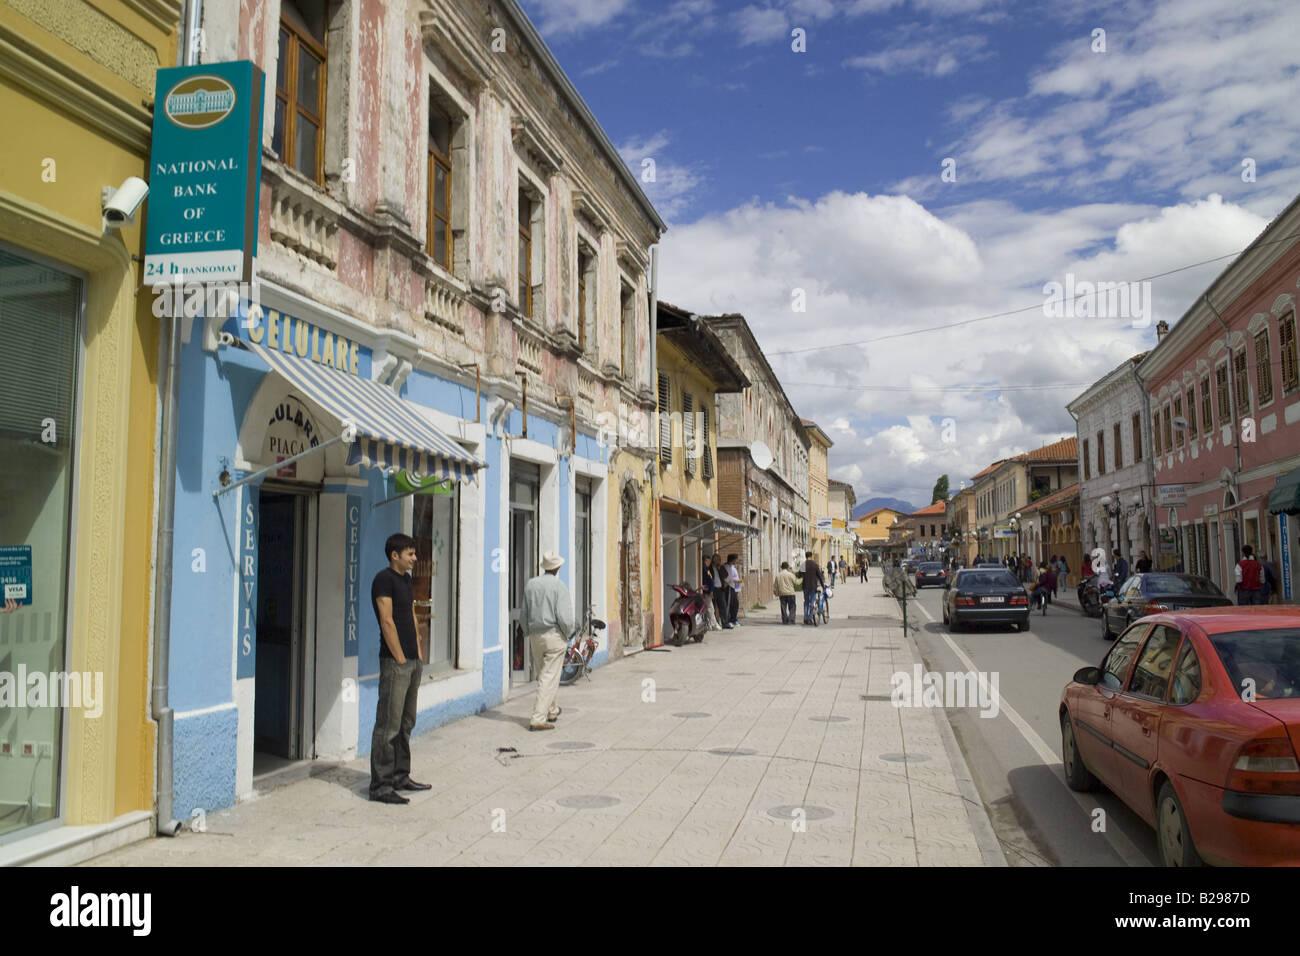 Skadar Albania Ref WP TARU 000730 109 Date COMPULSORY CREDIT World Pictures Photoshot - Stock Image